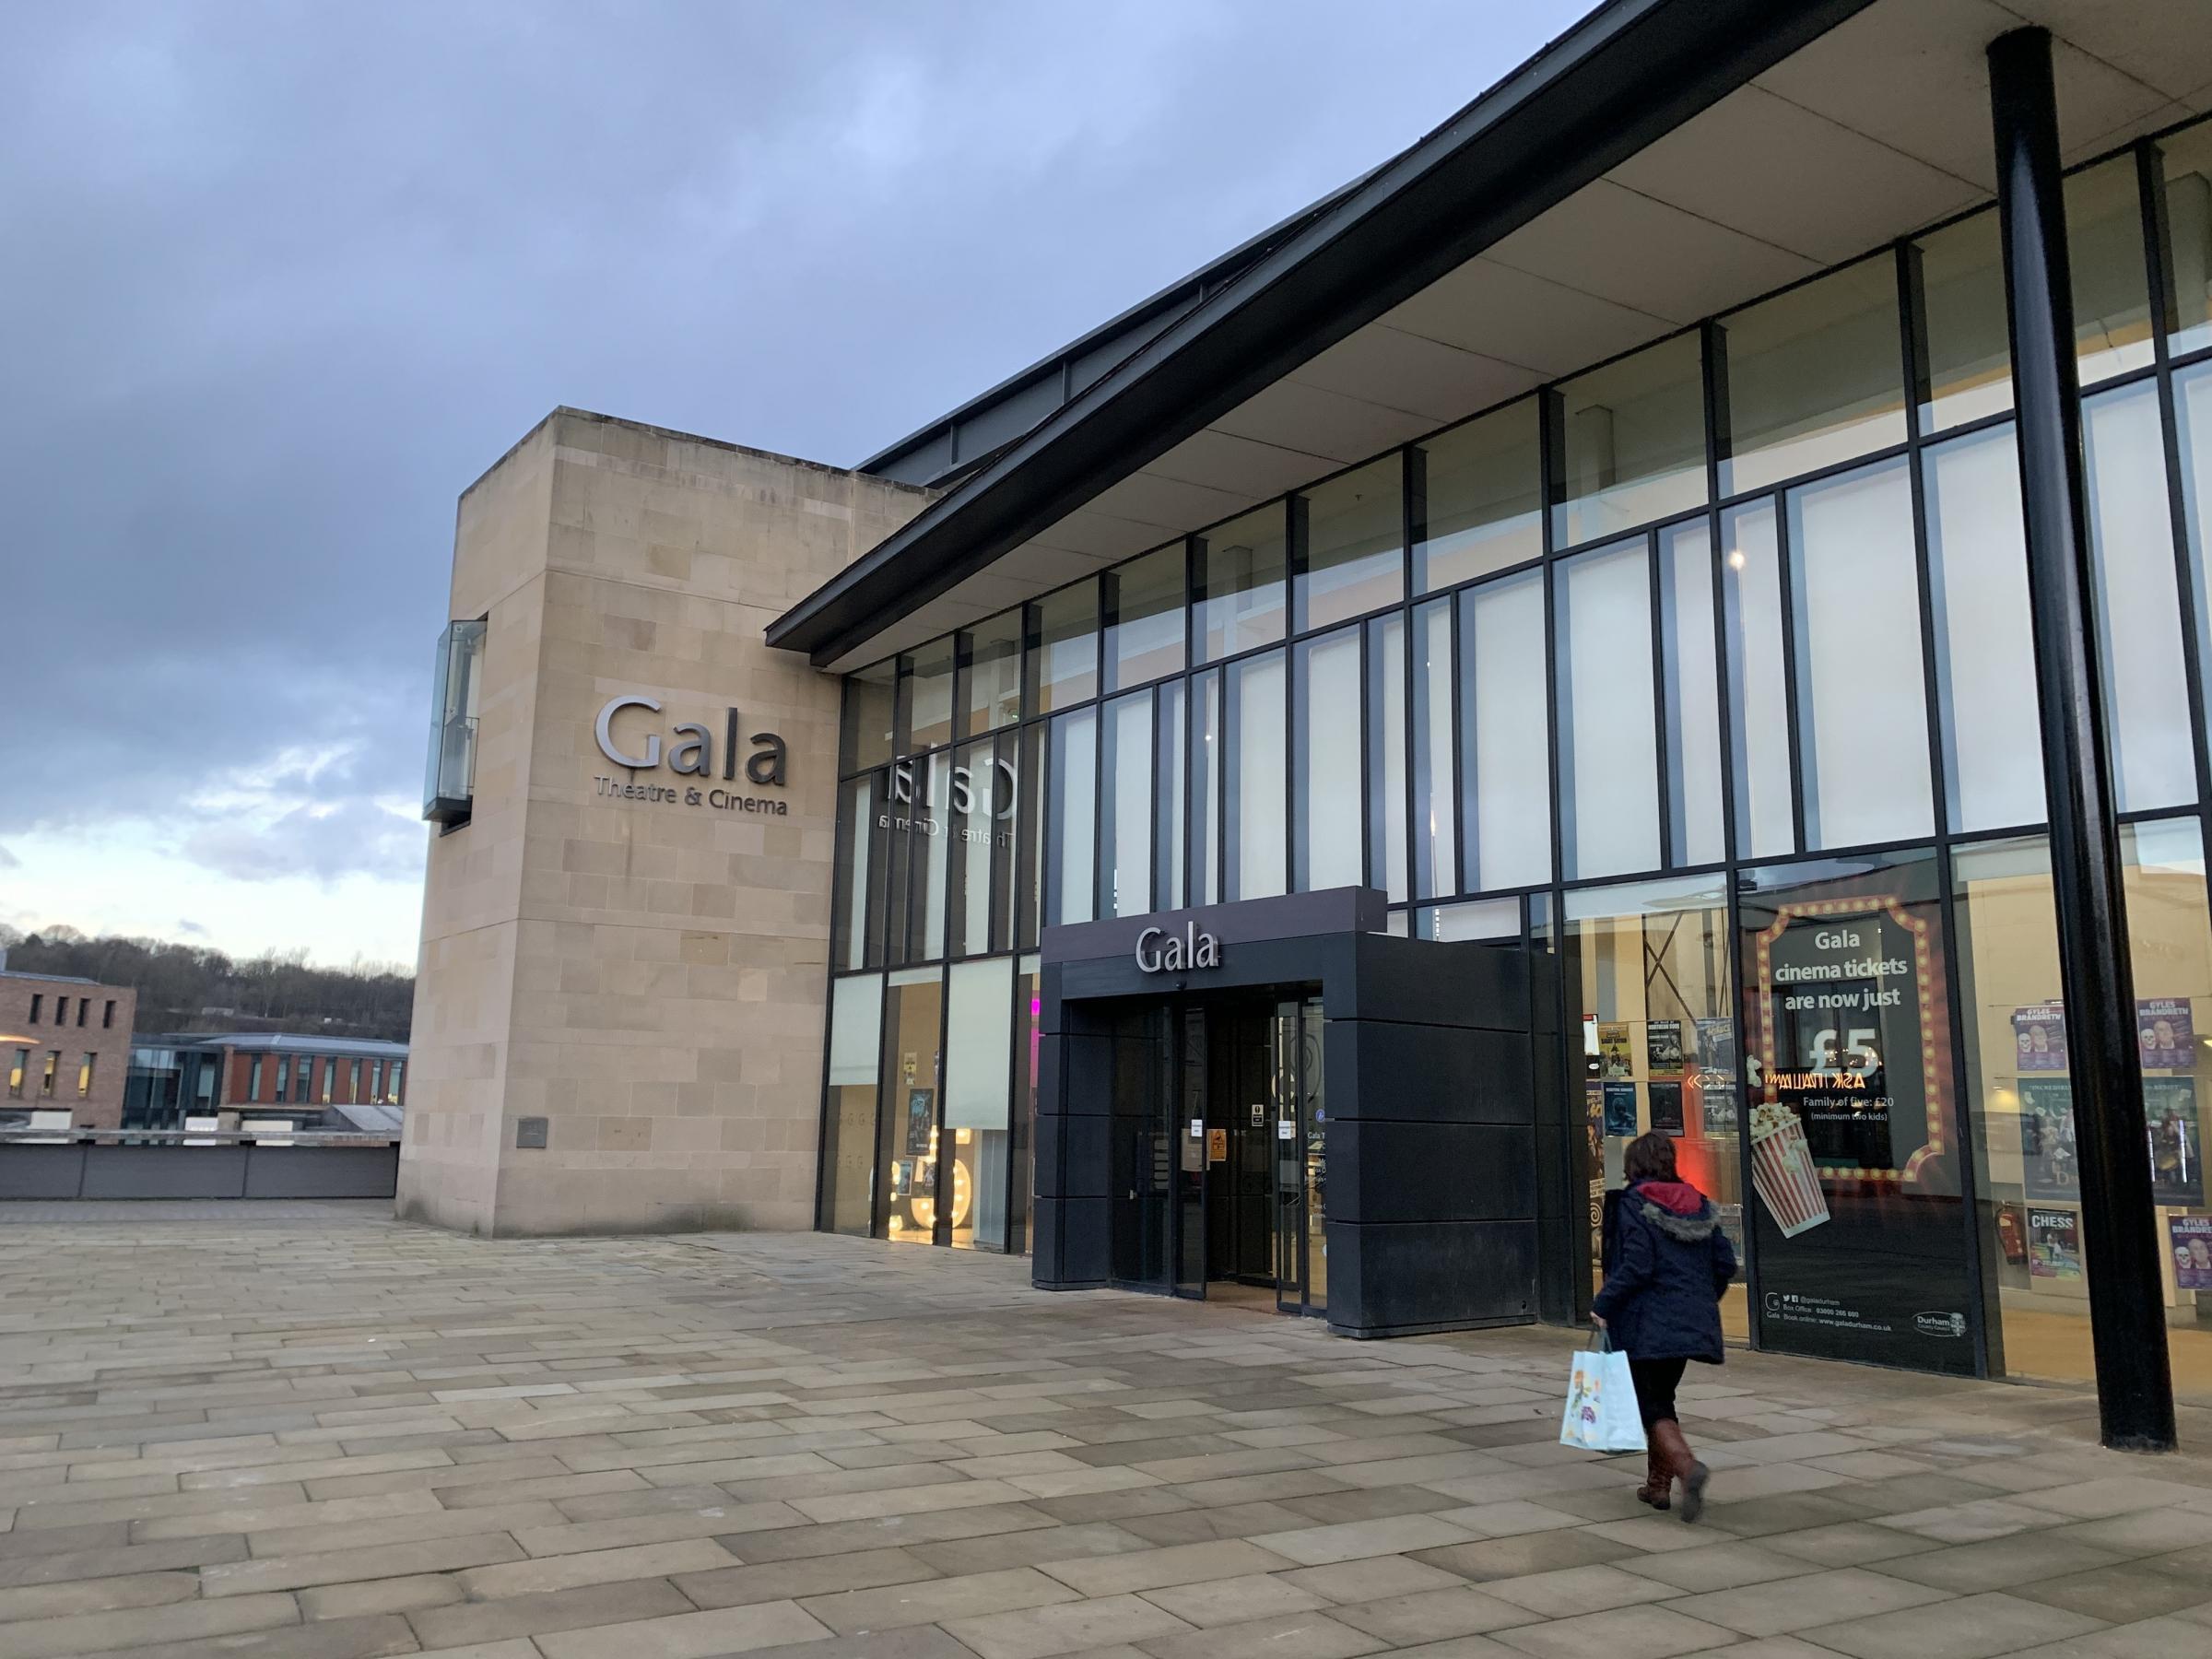 Durham Gala Theatre set to get pre-order drinks app